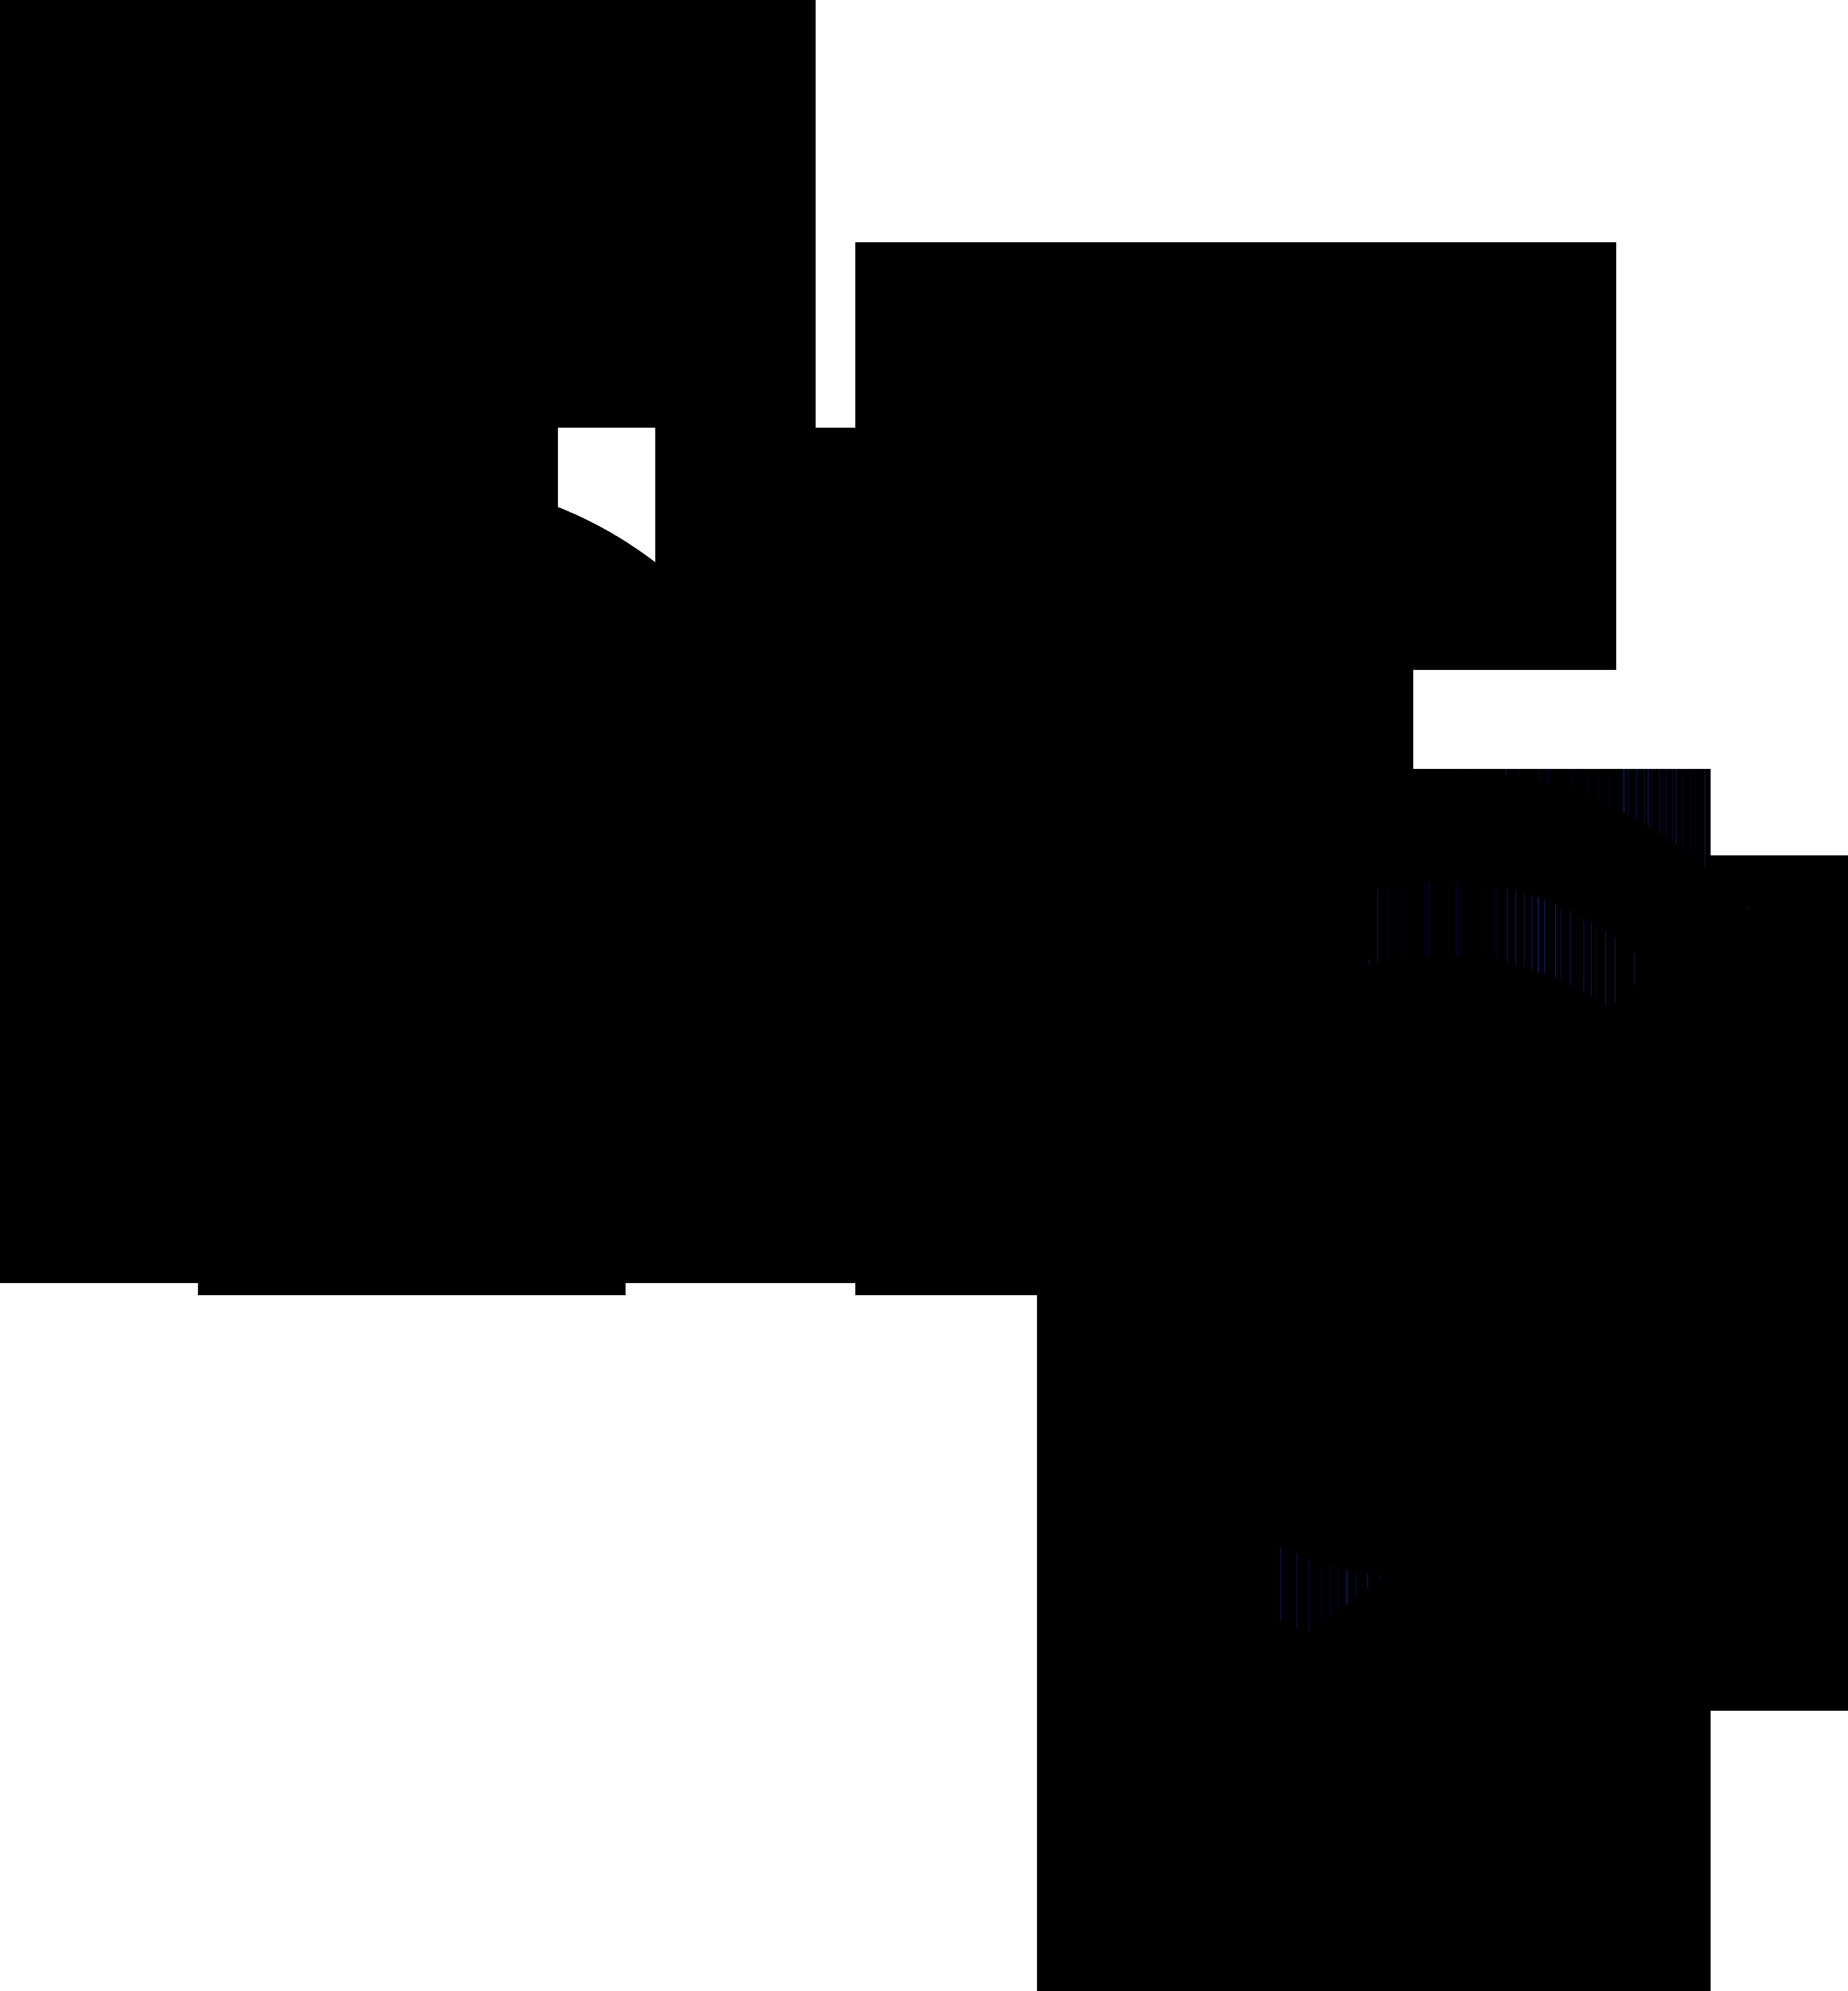 Nonbinary man symbol interlocked with nonbinary and Venus symbols.